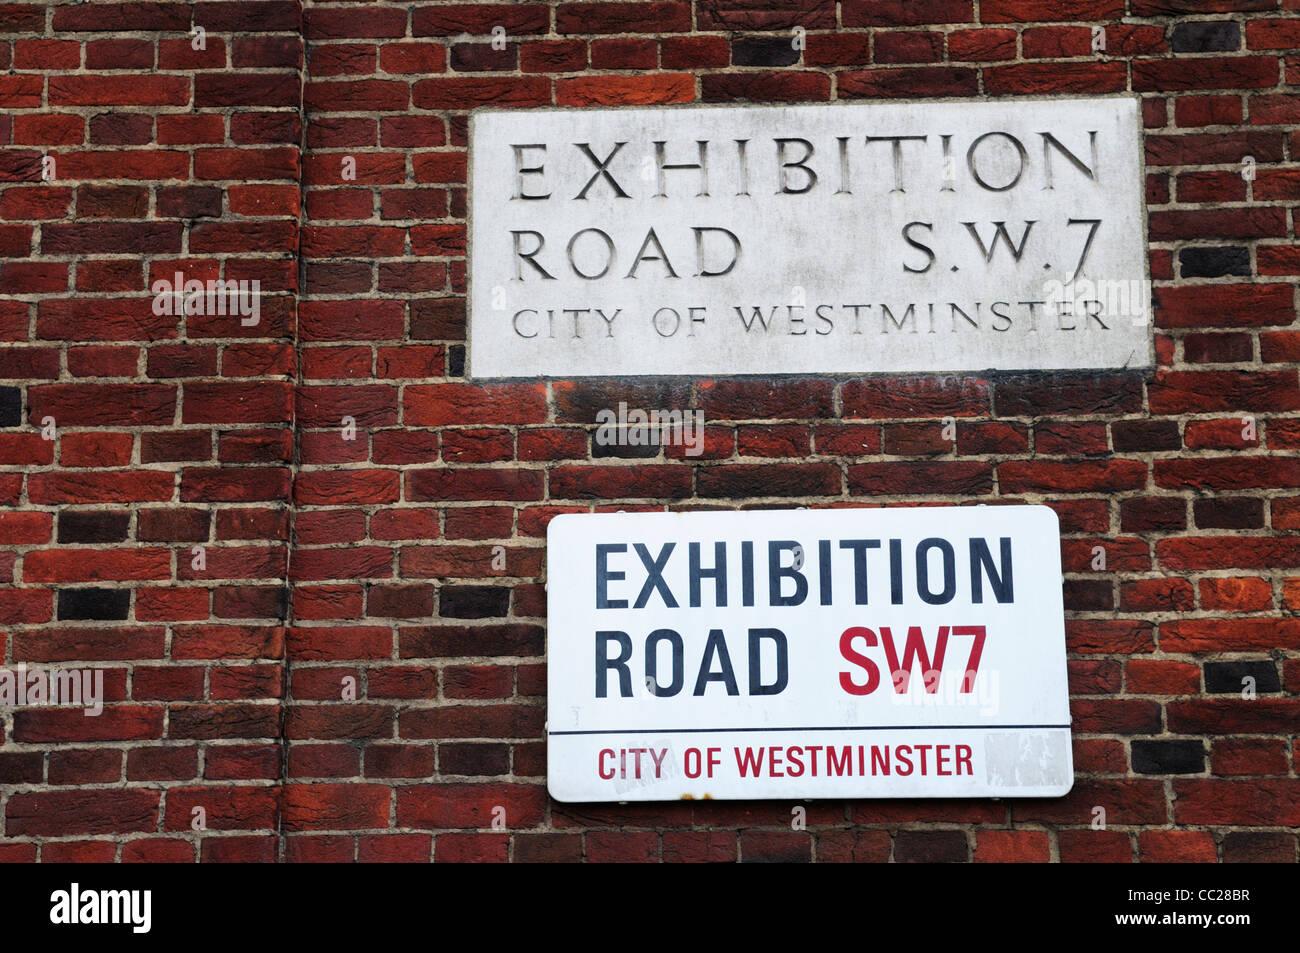 Exhibition Road SW7 Street Signs, Kensington, London, England, UK - Stock Image